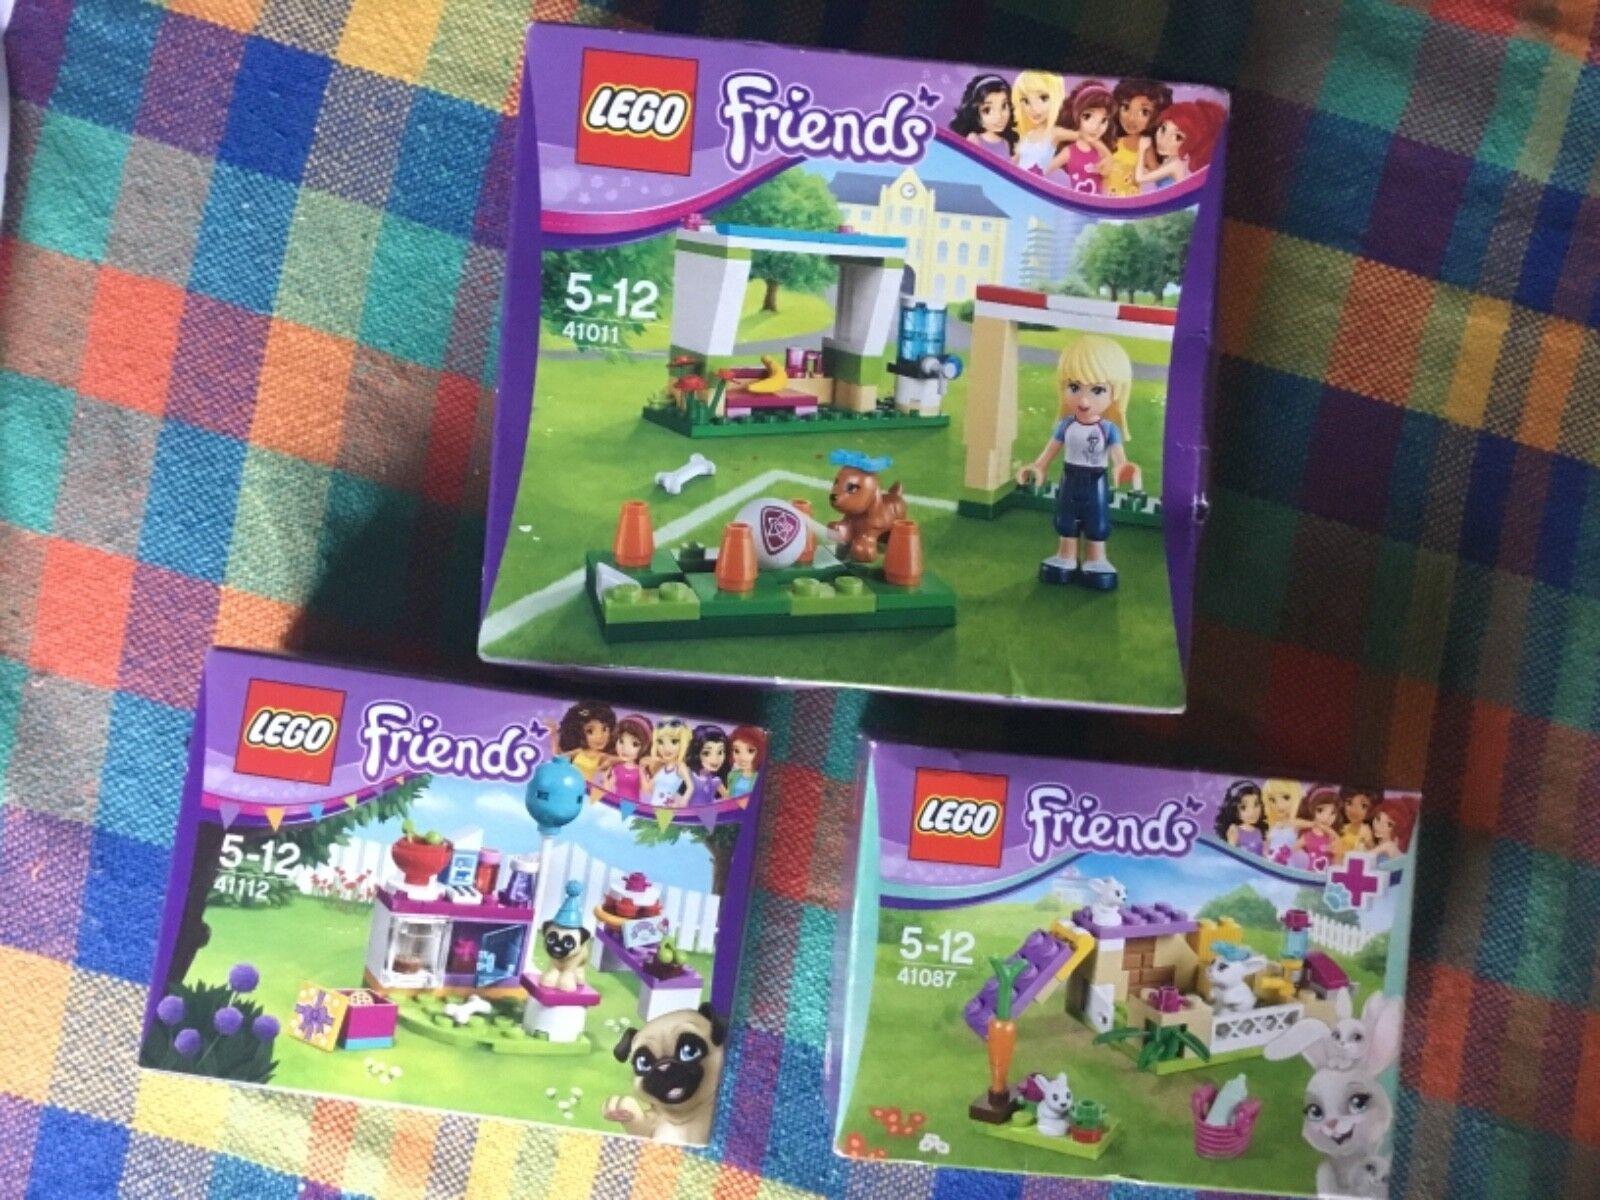 LEGO Friends 41087 Bunny Babies,41112 Birthday Dog Cake, 41011, Football Dog